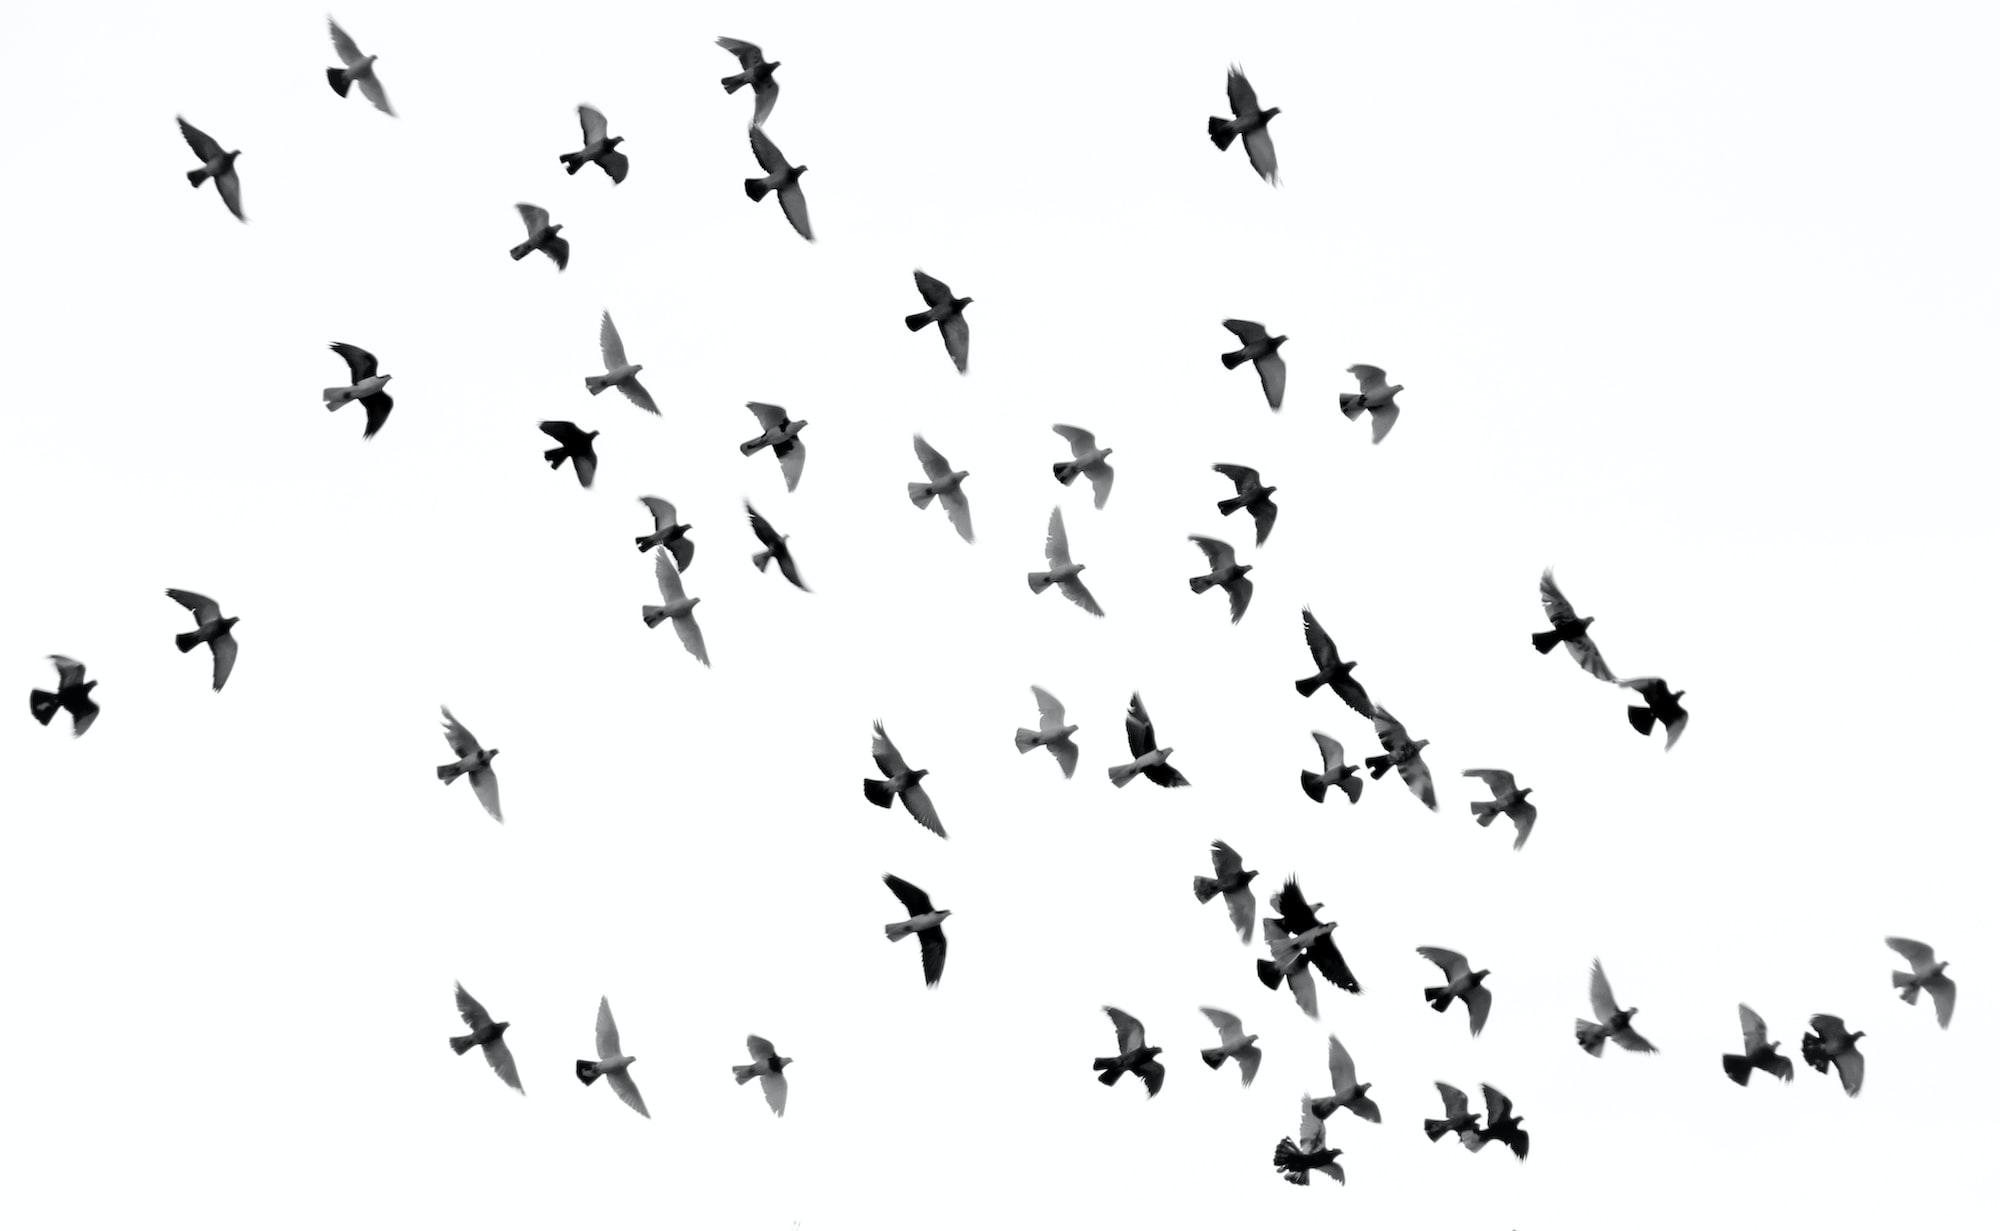 Hackerrank - Migratory Birds Solution